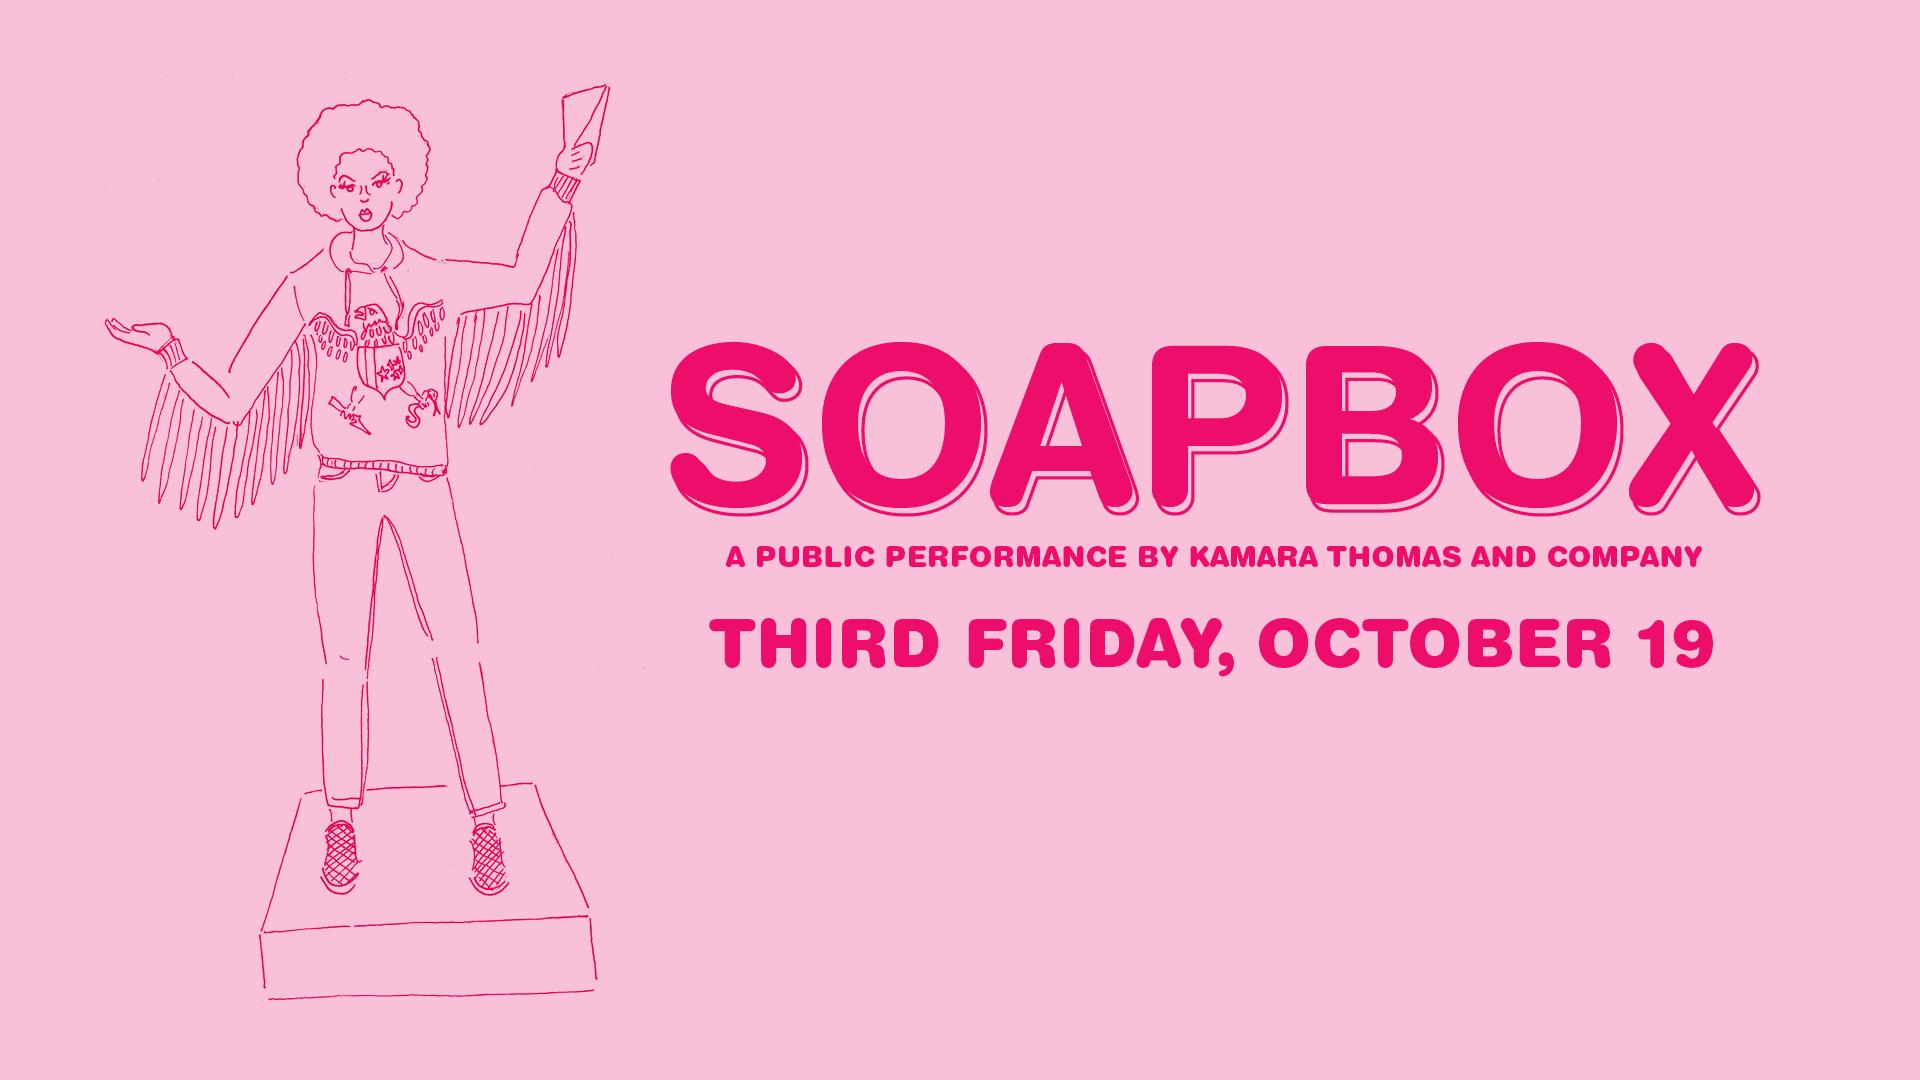 Soapbox_FB_Event_banner_1920x1080.jpg